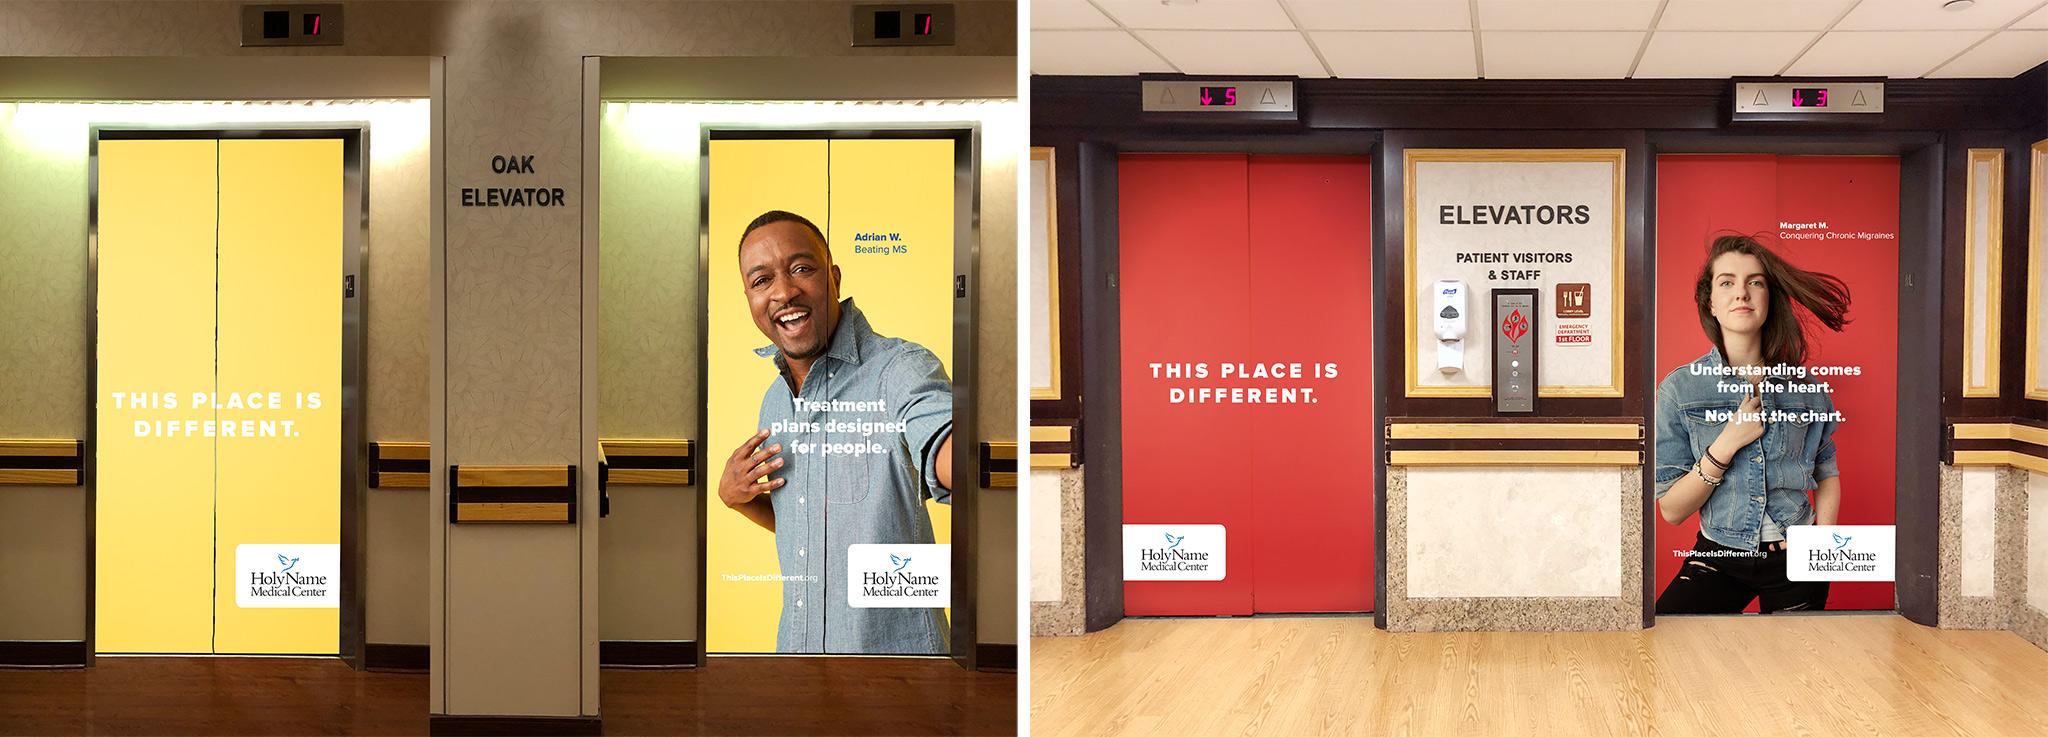 holyname-Elevators